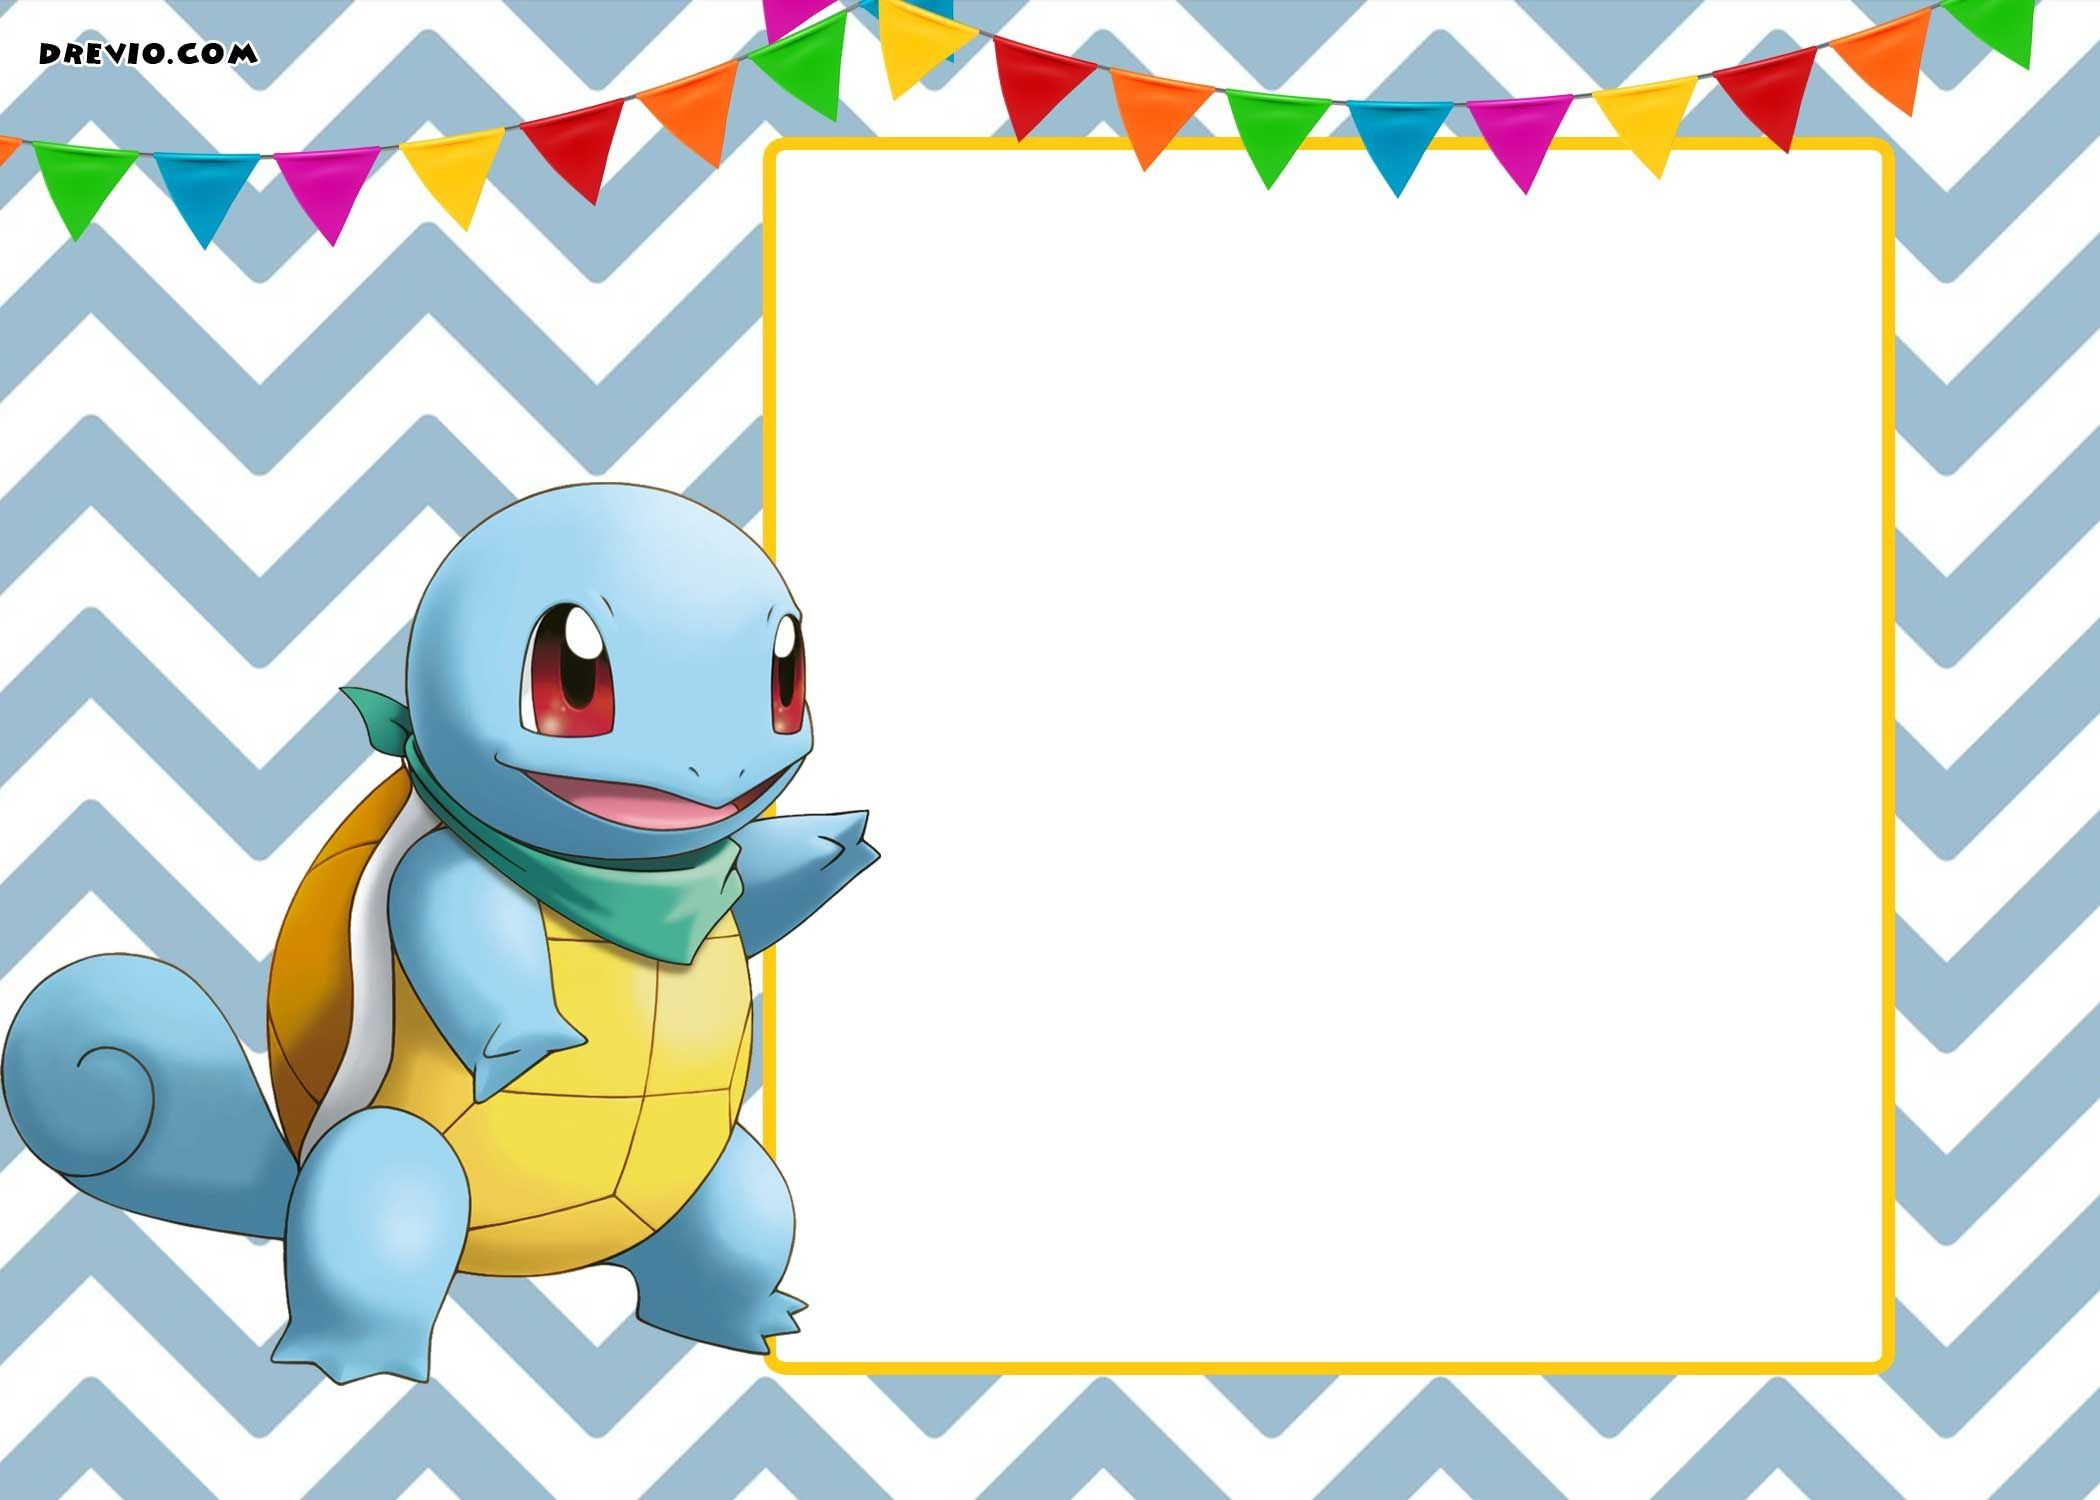 Free Printable Pokemon Invitation | Free Printable Birthday - Free Printable Pokemon Birthday Invitations